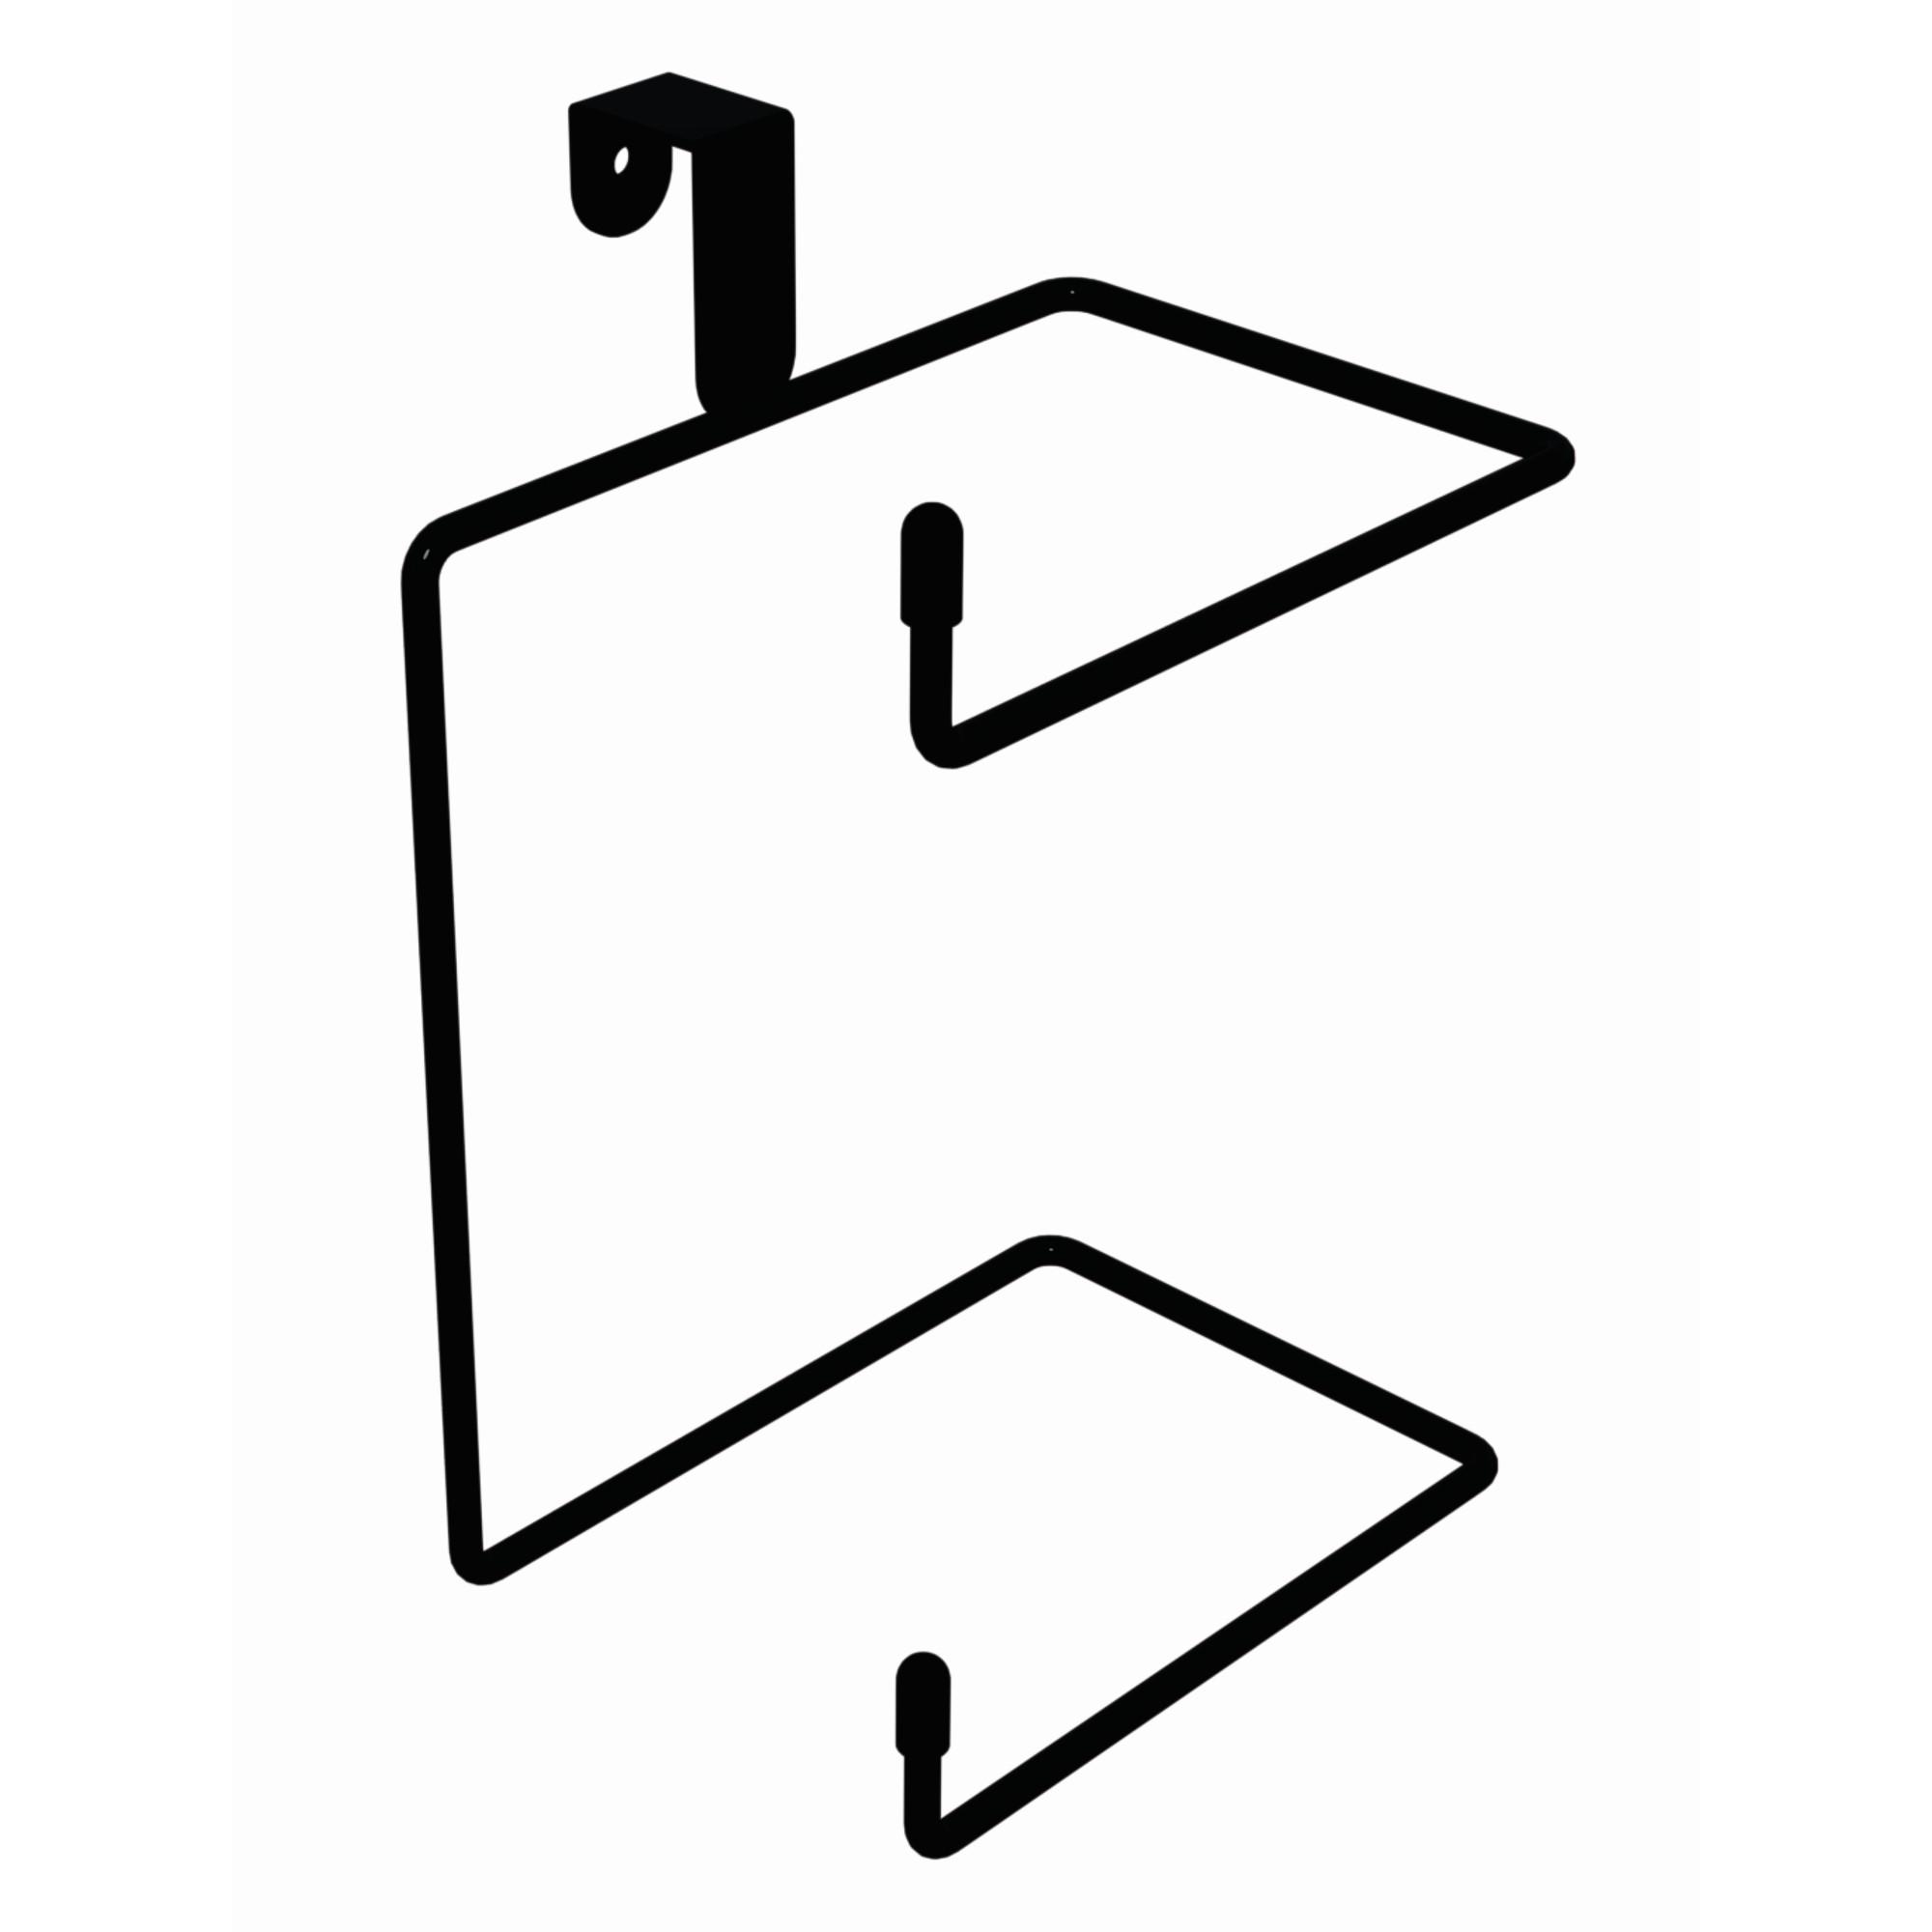 Porta Papel Higienico Preto Caixa Acoplada Duplo Aco - Dicarlo